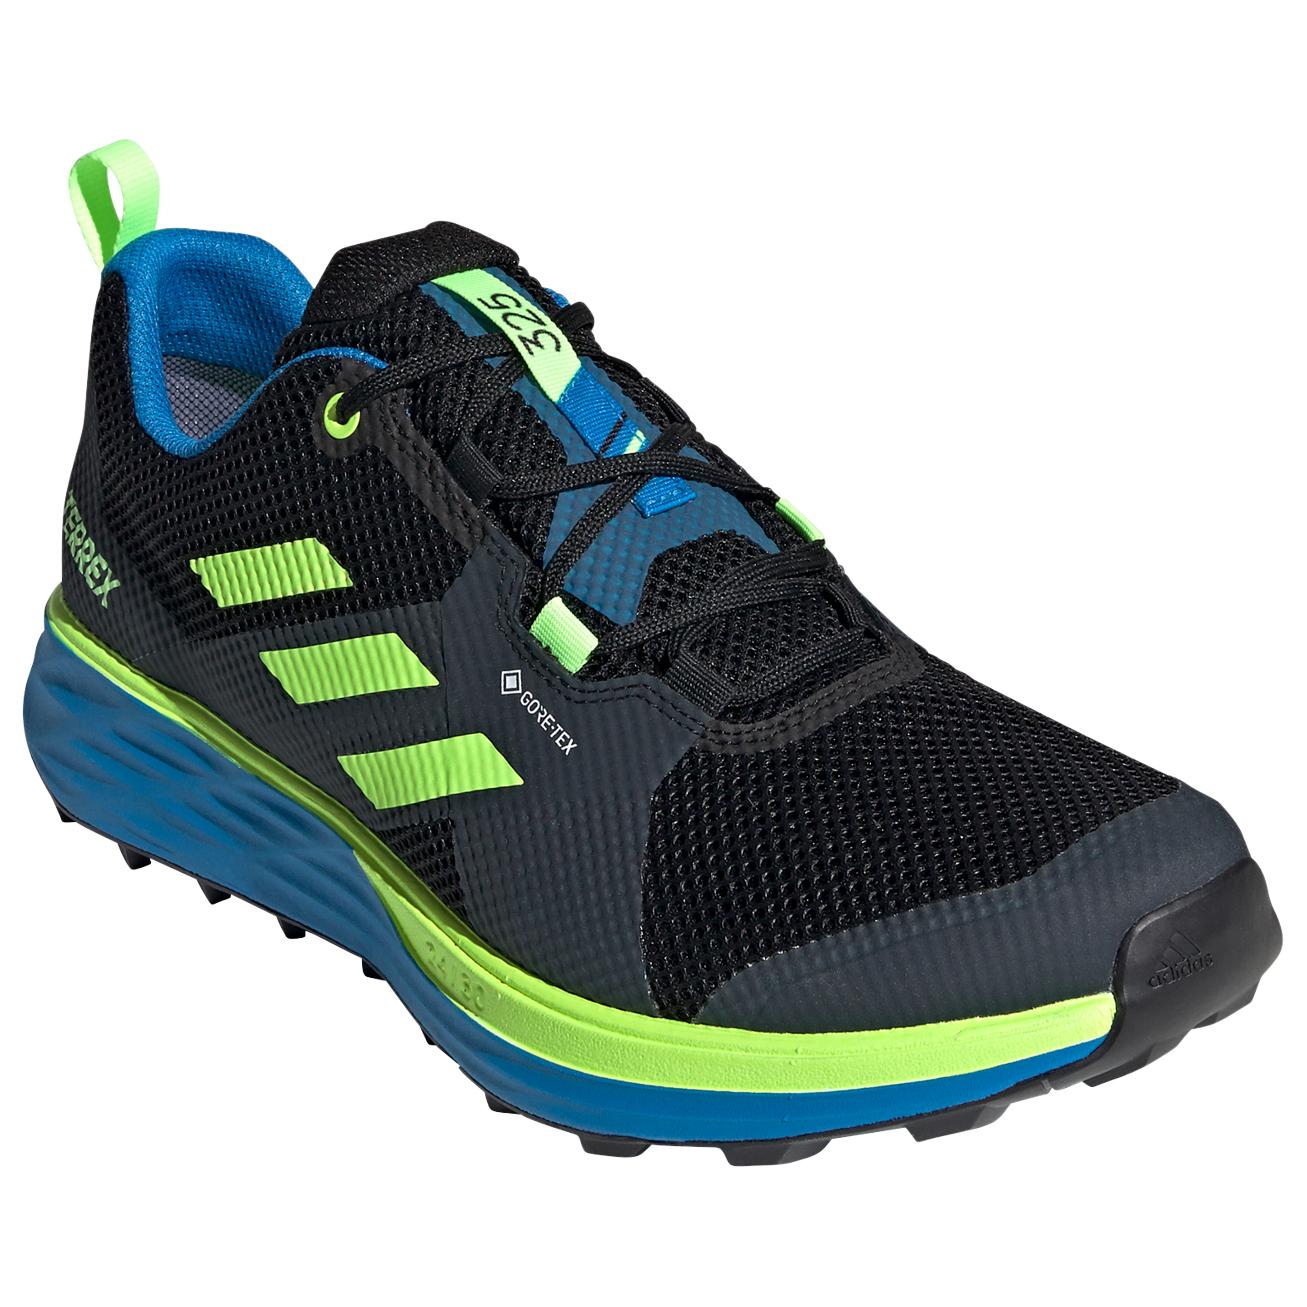 f39272374f792b Adidas Terrex Two GTX - Trailrunningschuhe Herren online kaufen ...